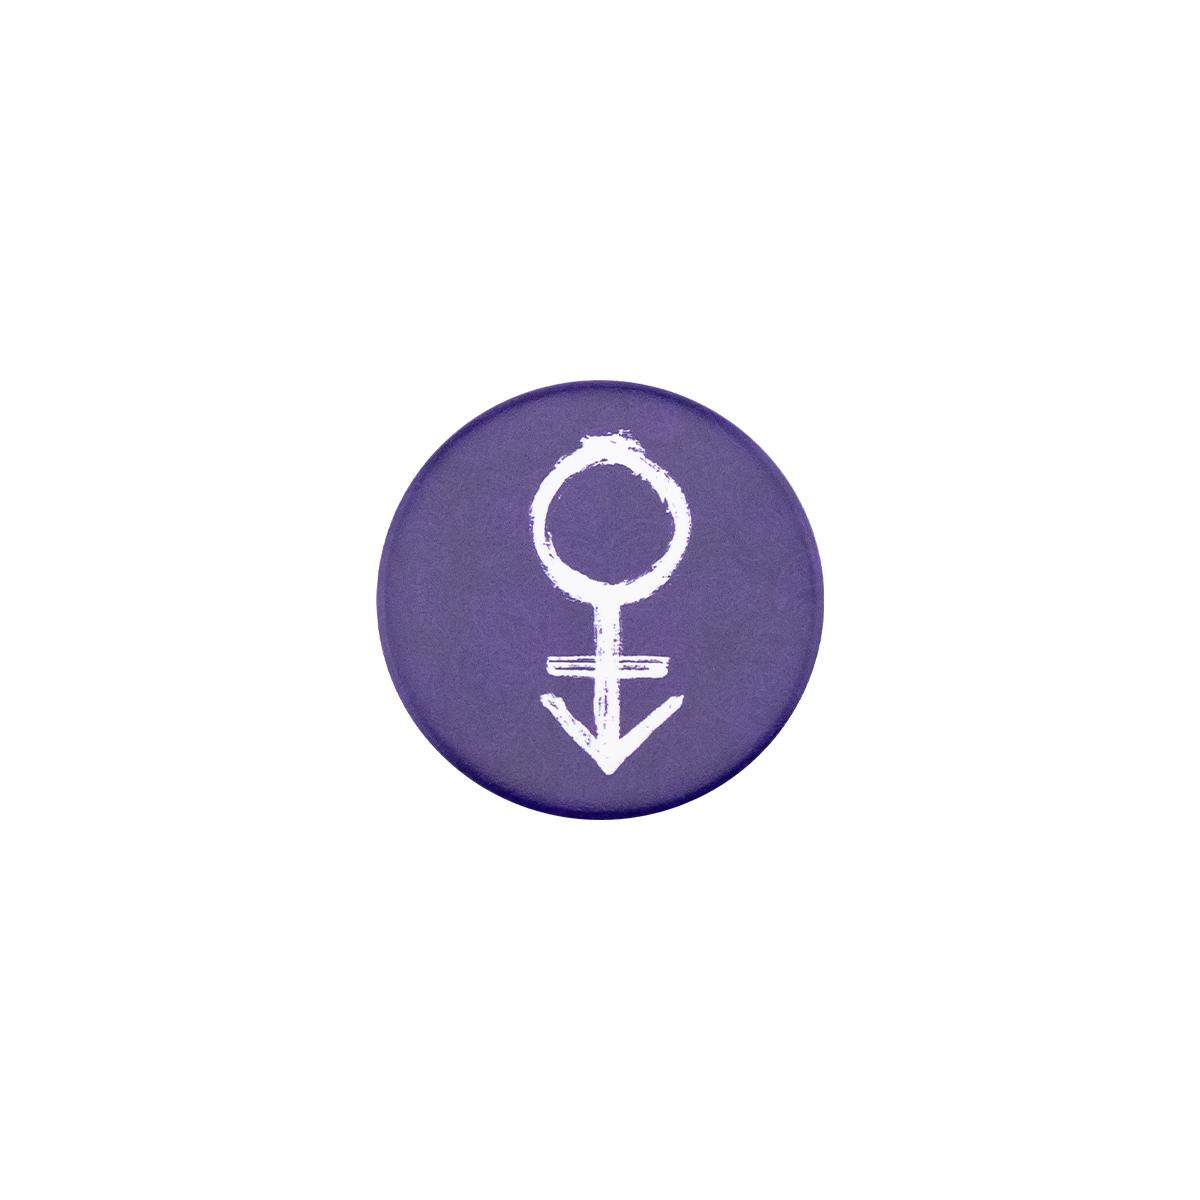 Prince Symbol #1 PopSocket (Purple Paisley)